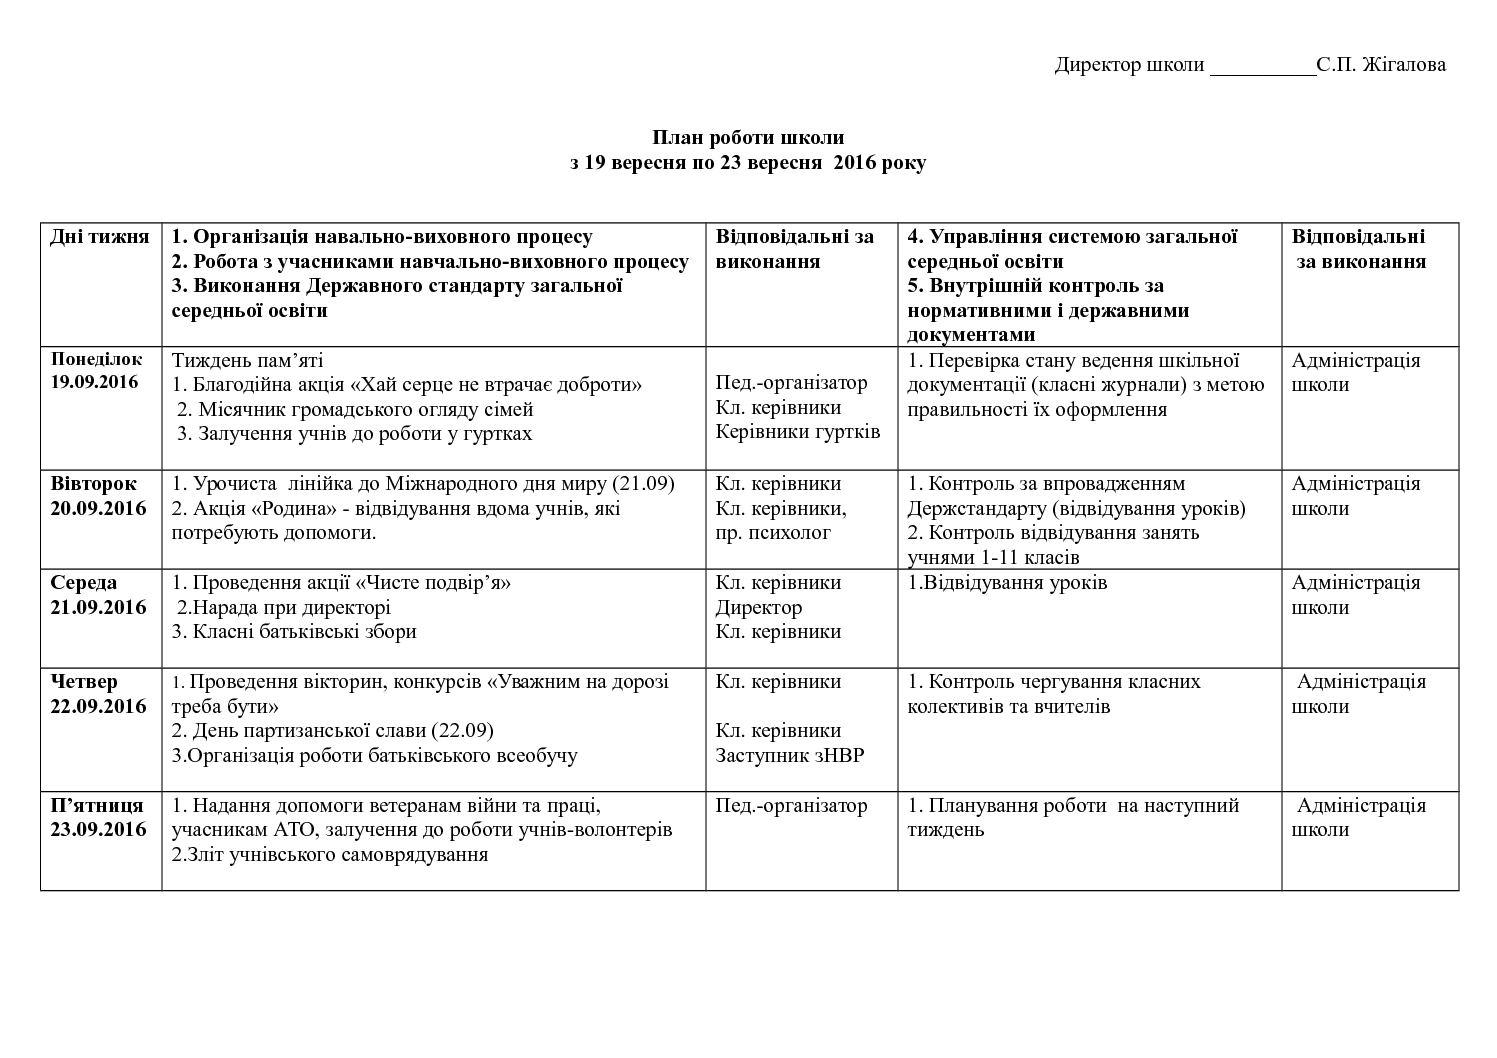 план роботи школи Doc - CALAMEO Downloader f88622c18bf63